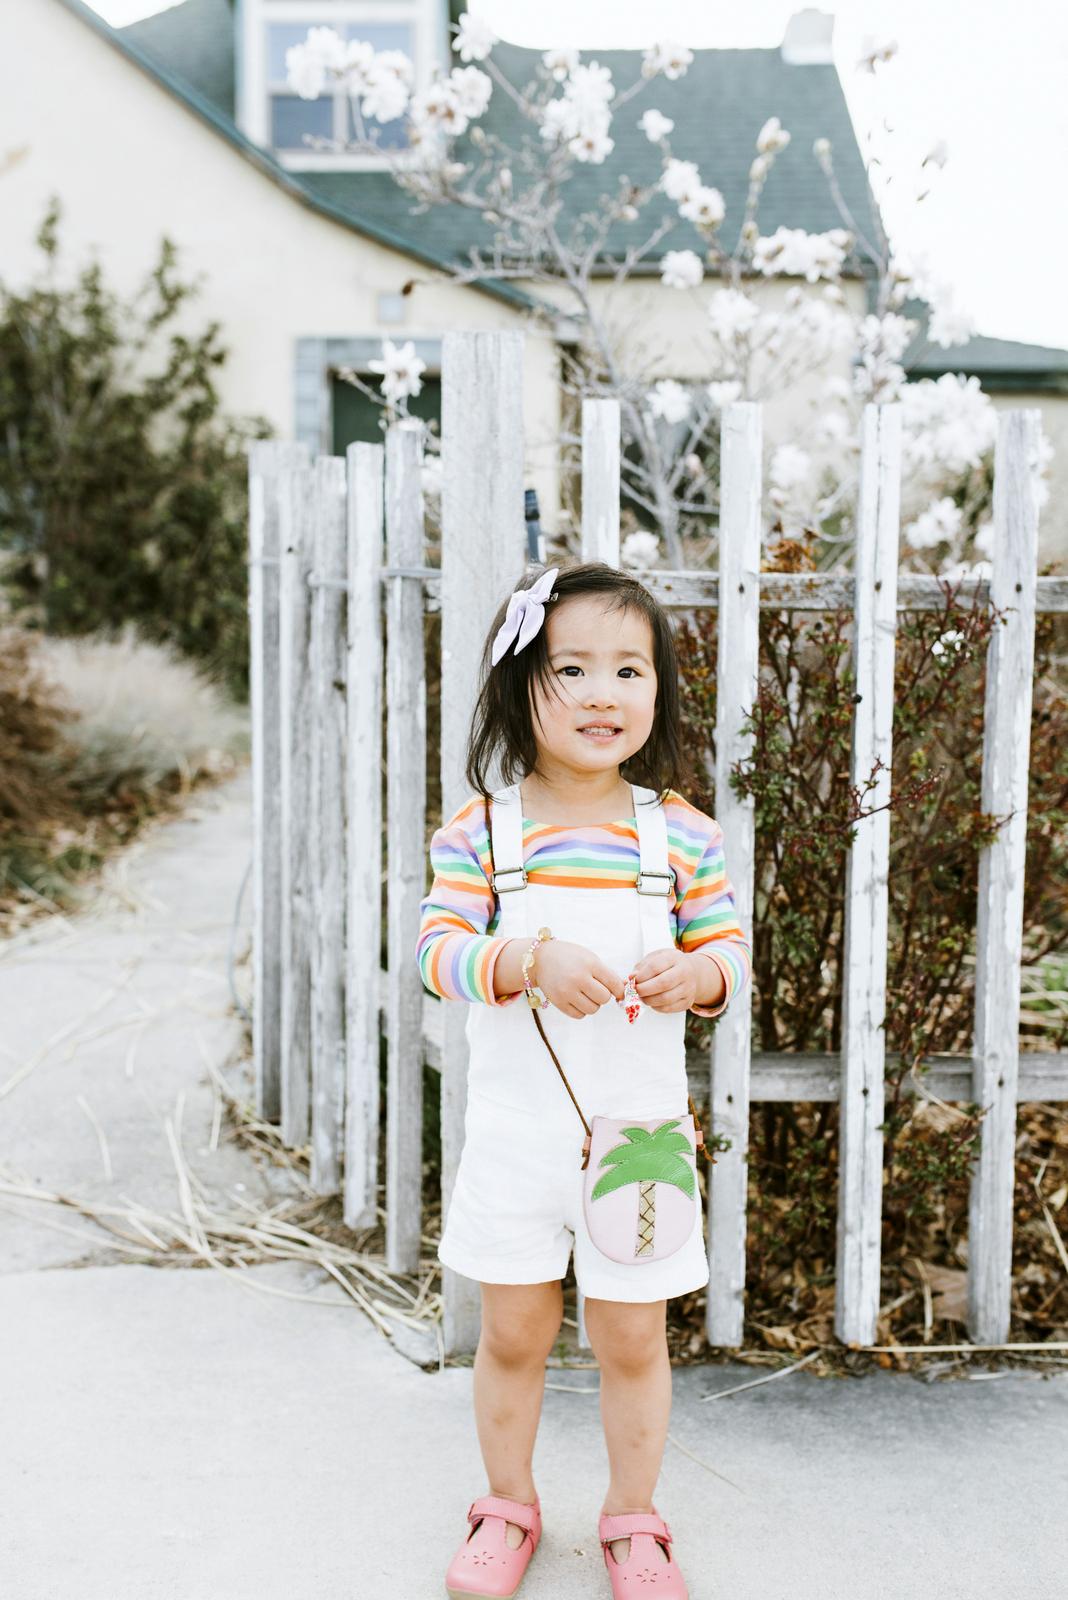 Bobux Toddler Sandals by fashion blogger Sandy A La Mode